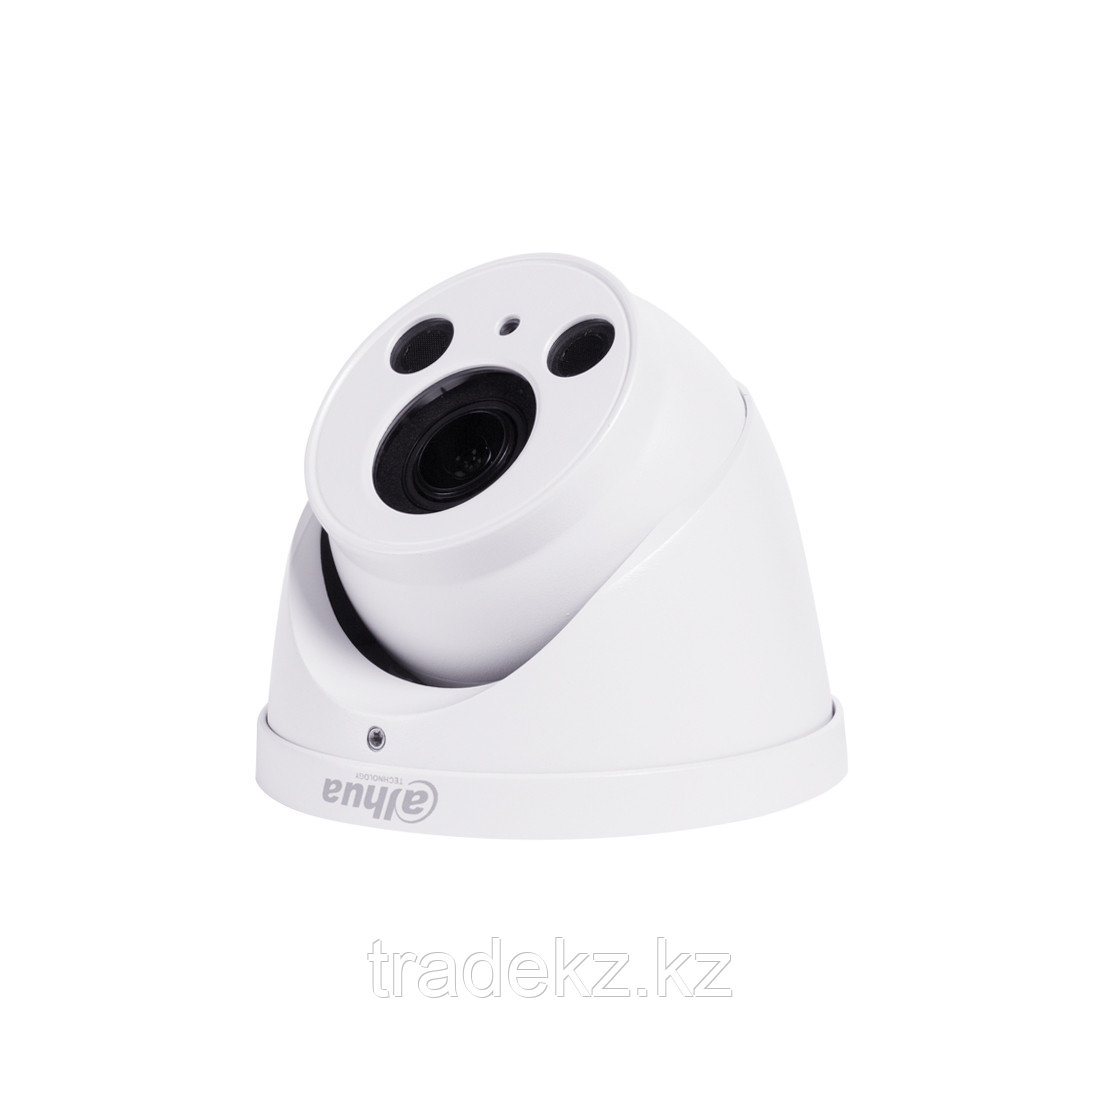 Купольная сетевая камера Dahua DH-IPC-HDW2231RP-ZS